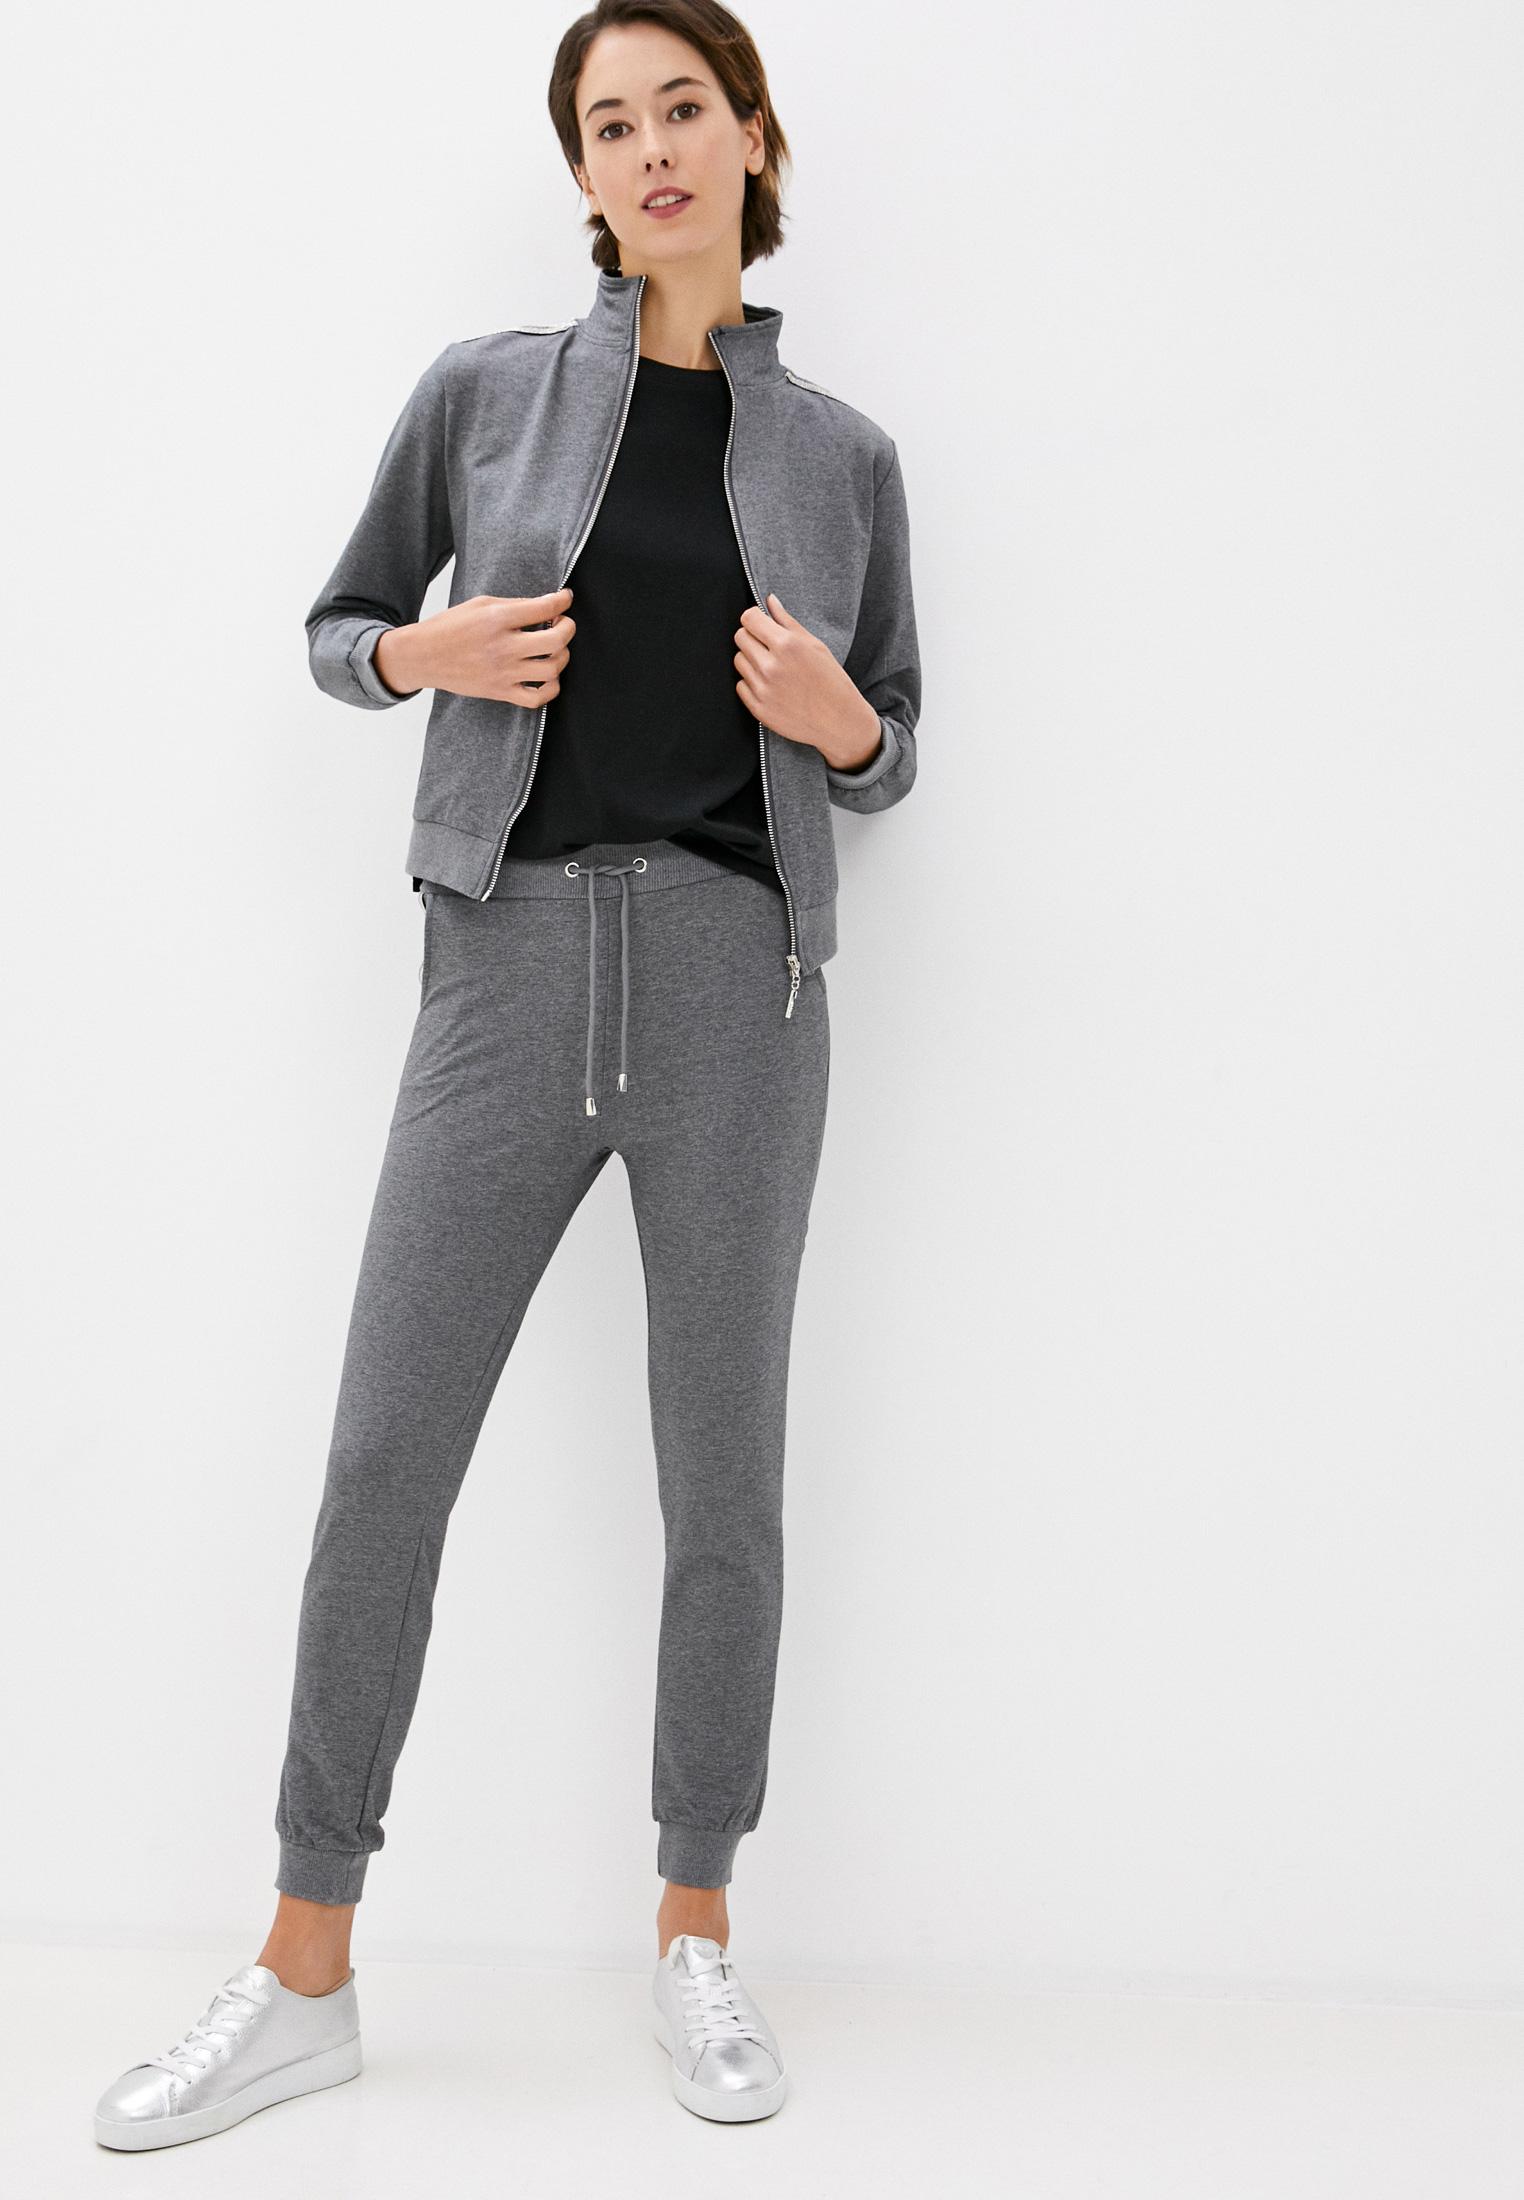 Костюм с брюками Modelle 8190-2